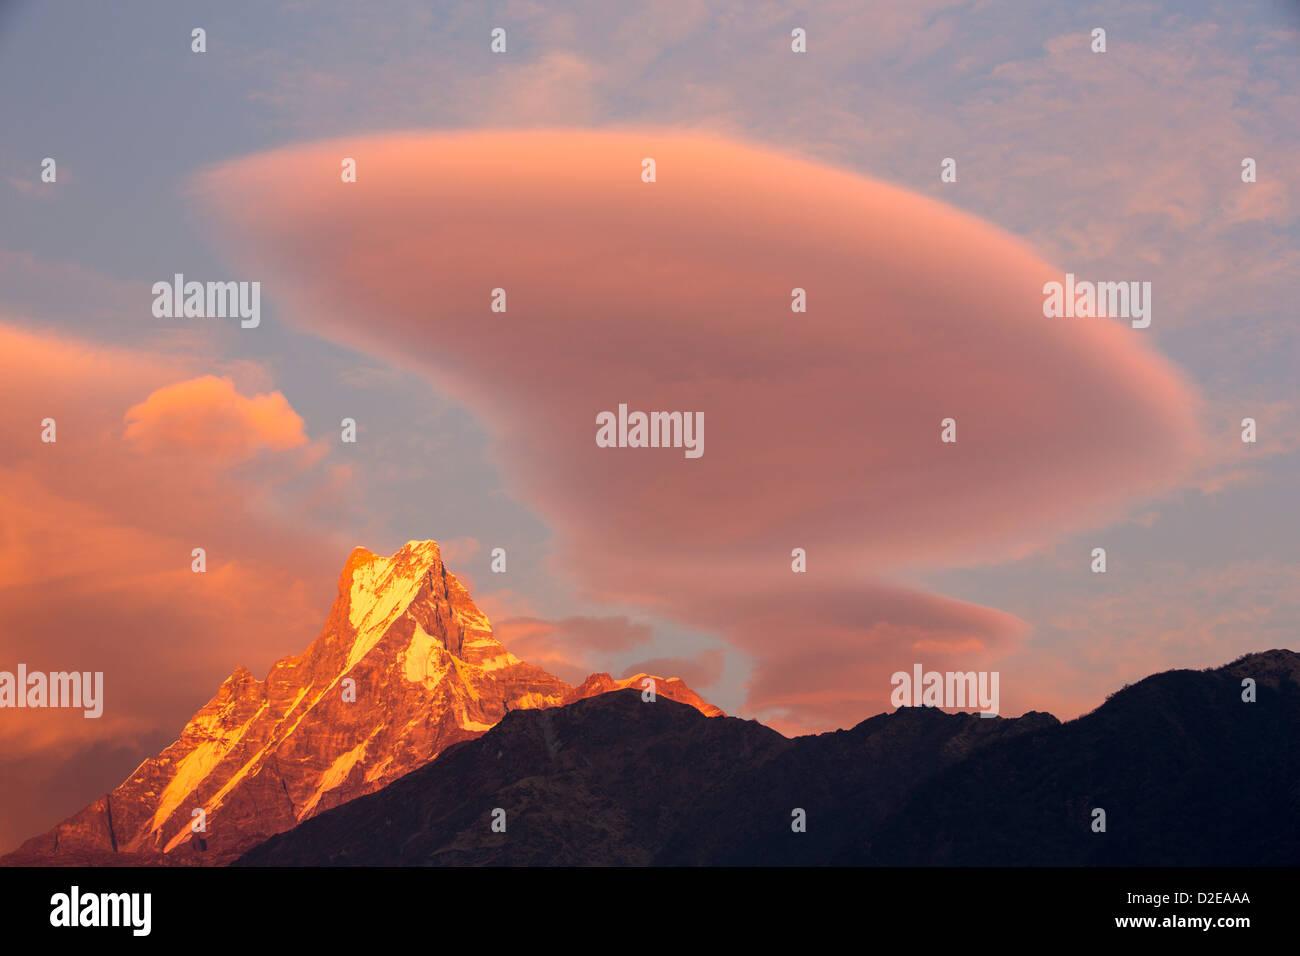 Alpenglow at sunset on Machapuchare, Annapurna Sanctuary, Nepelese Himalayas. - Stock Image